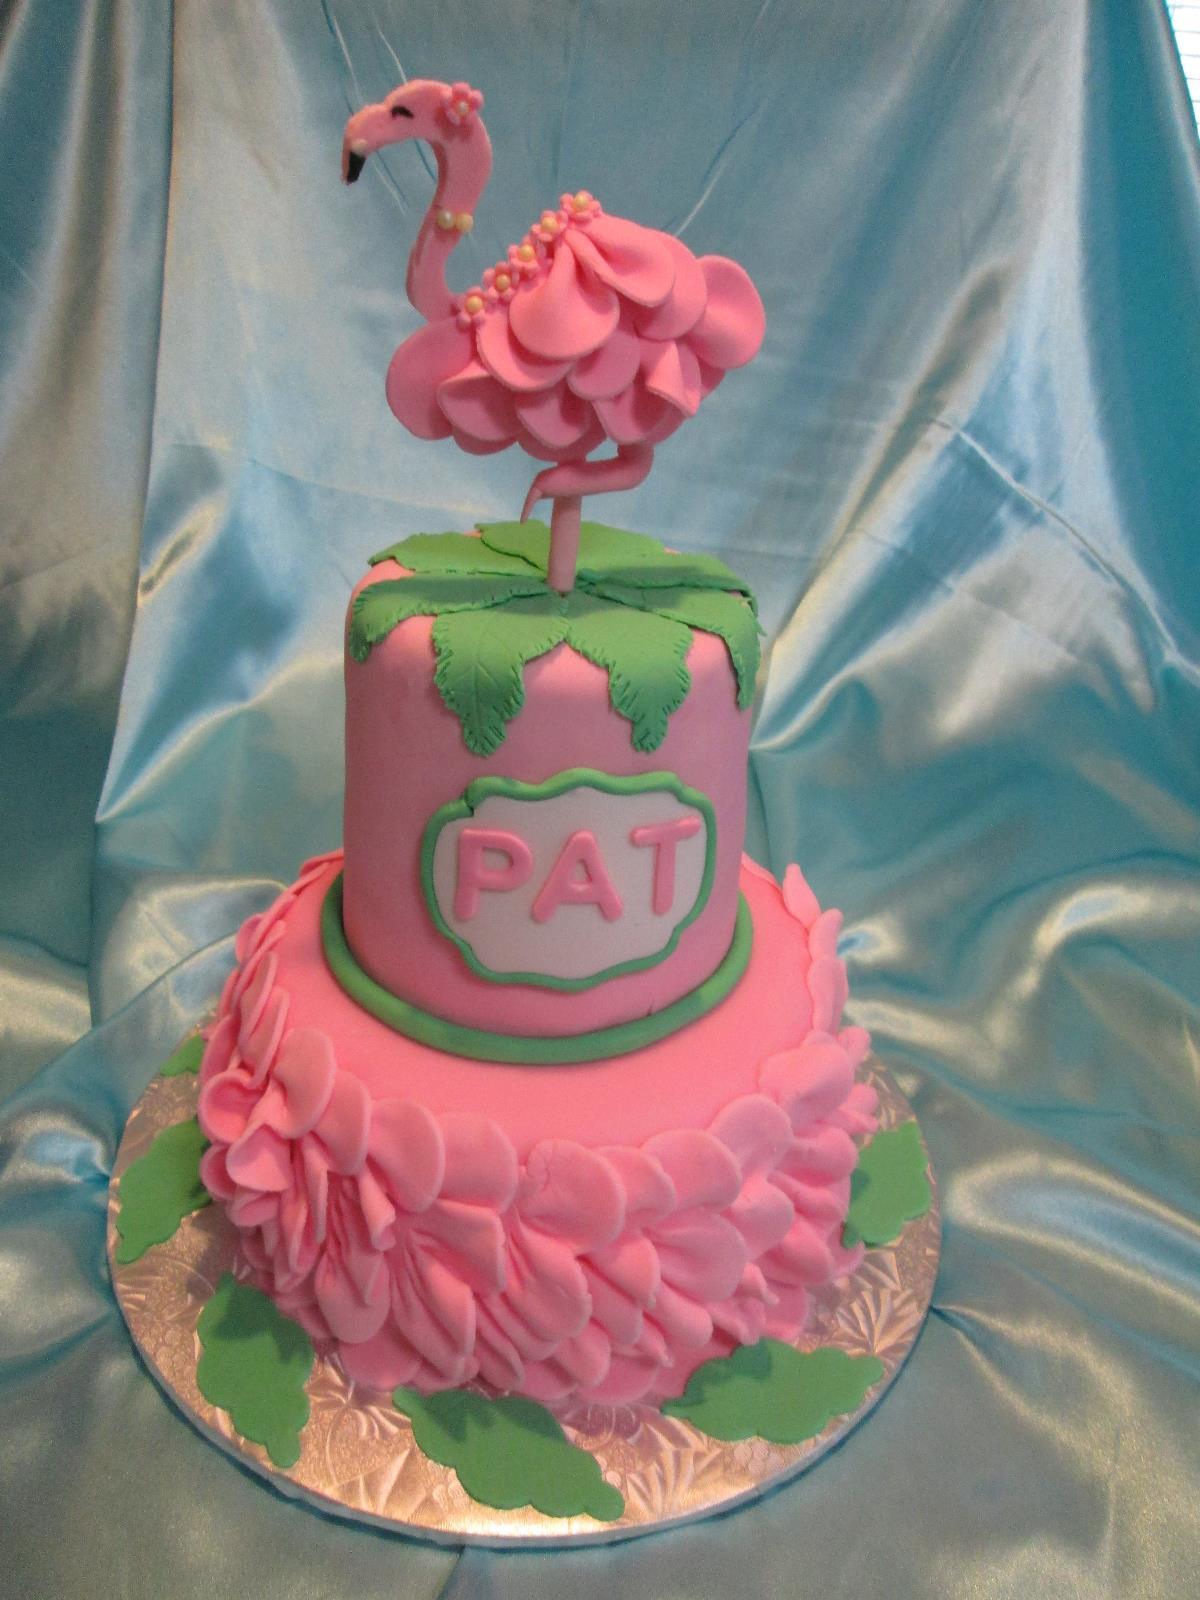 Flamingo Cake by Leonor Rodriguez